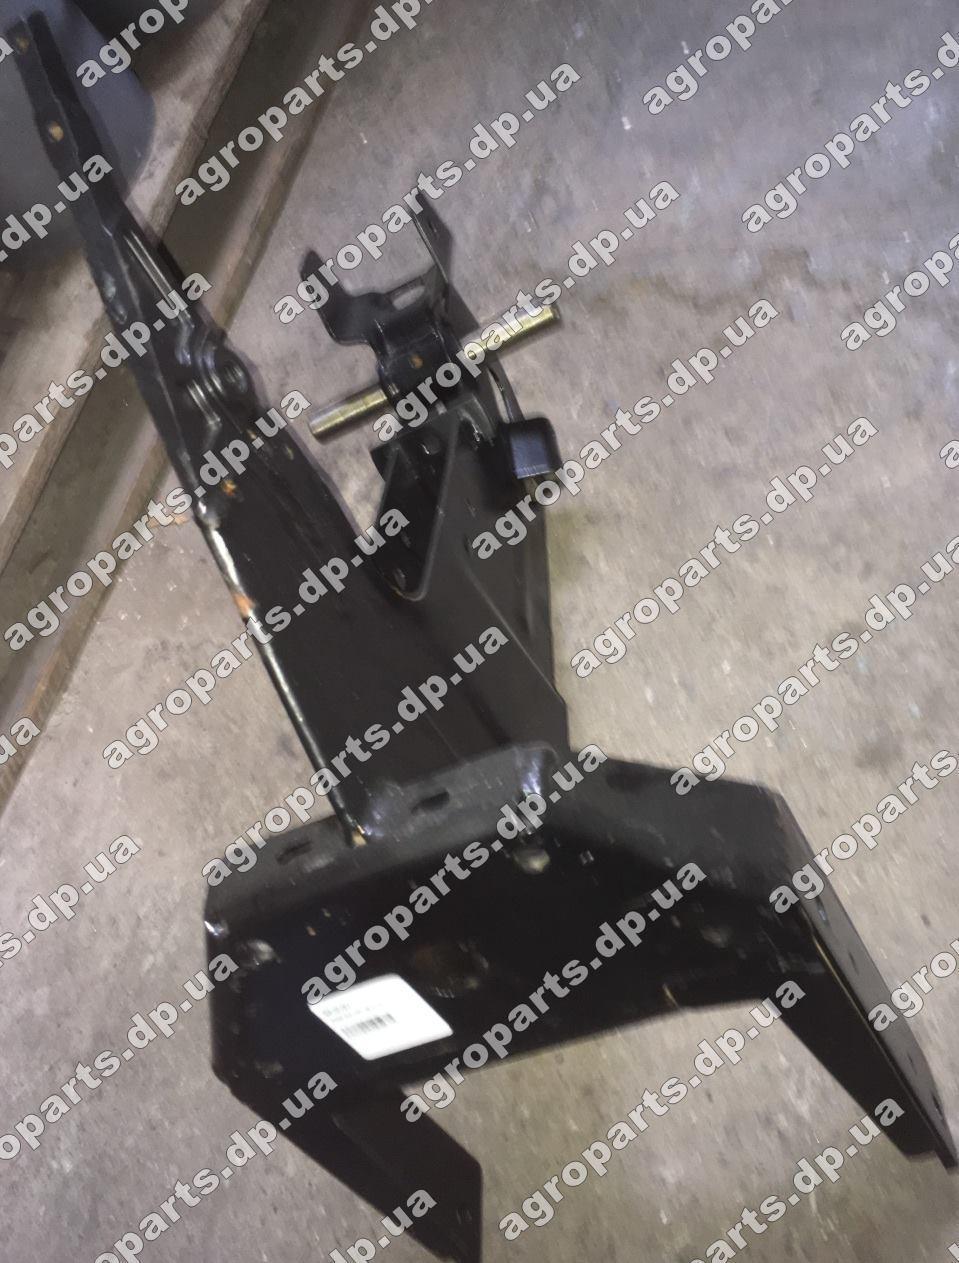 Рама GA10157 секция Shank W/Gauge Wheel Pivot Spindle Kinze станина ga10157 корпус